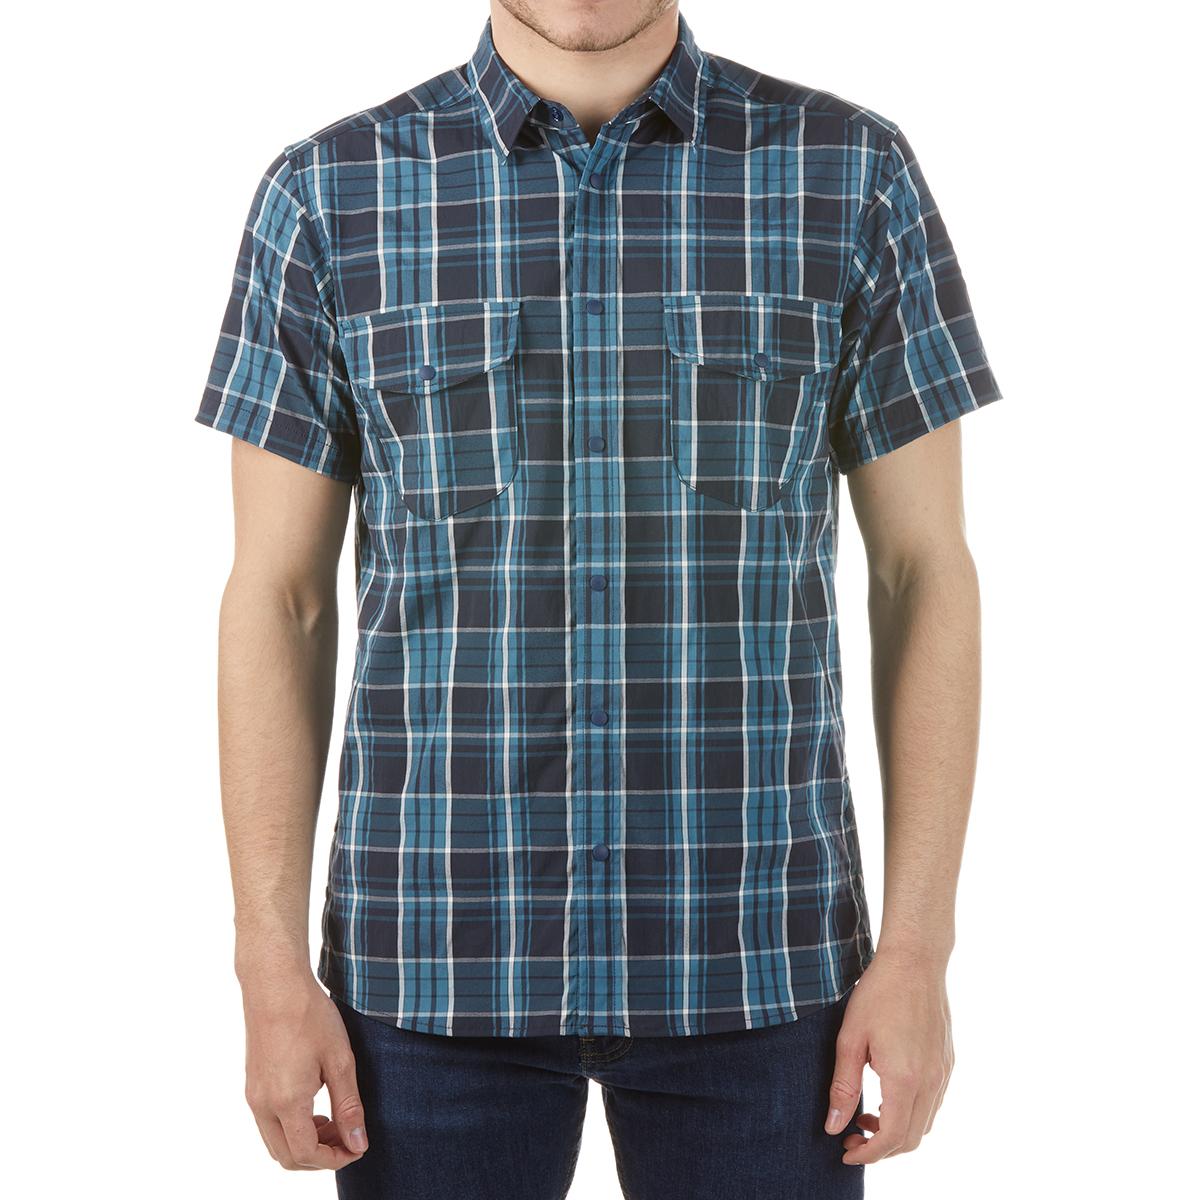 Karrimor Men's Yacuma Original Check Short-Sleeve Shirt - Blue, L